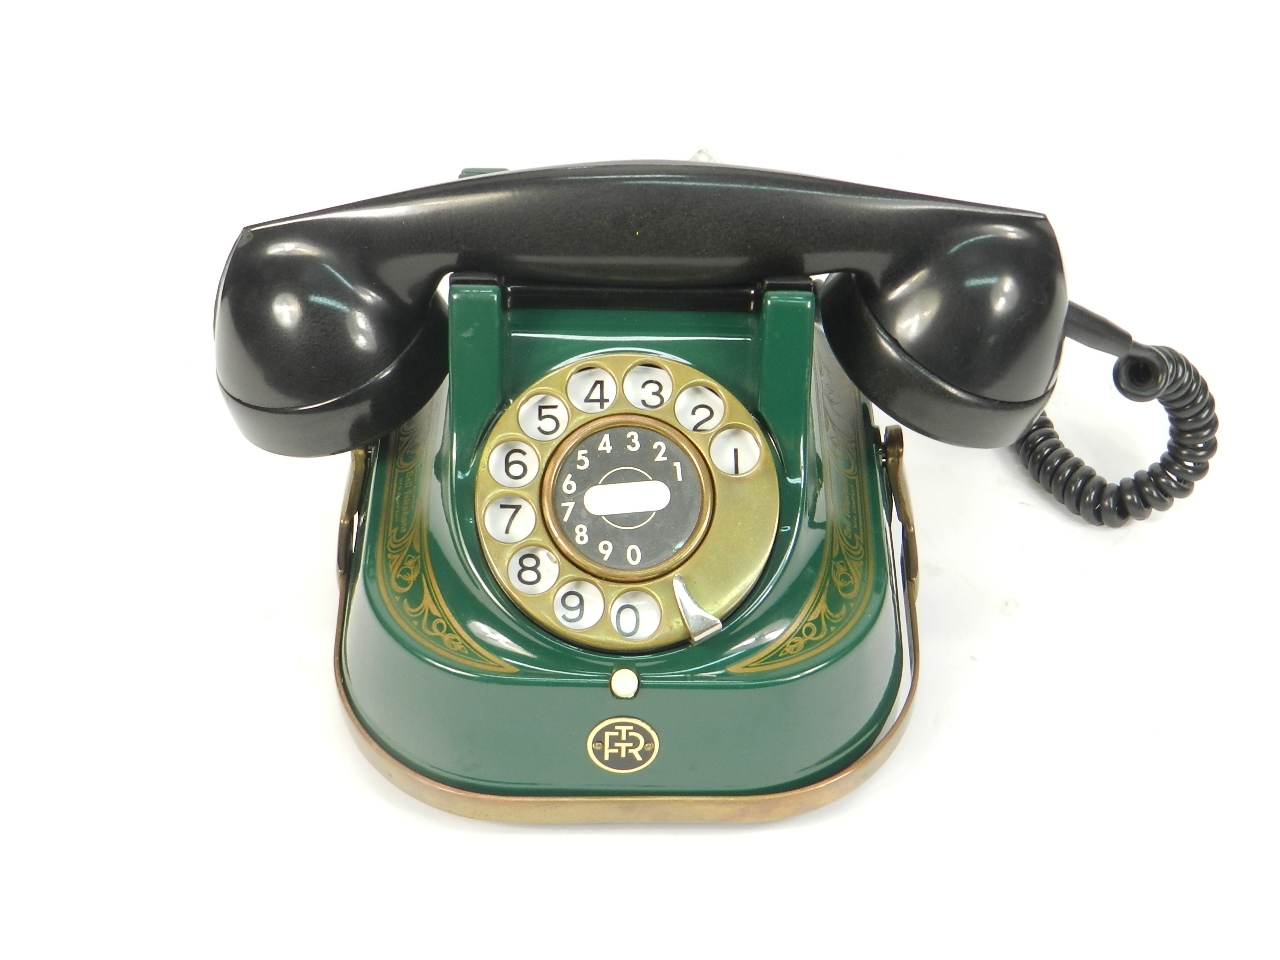 Imagen BELL TELEPHONE Cº  AÑO 1940, BELGICA 41396